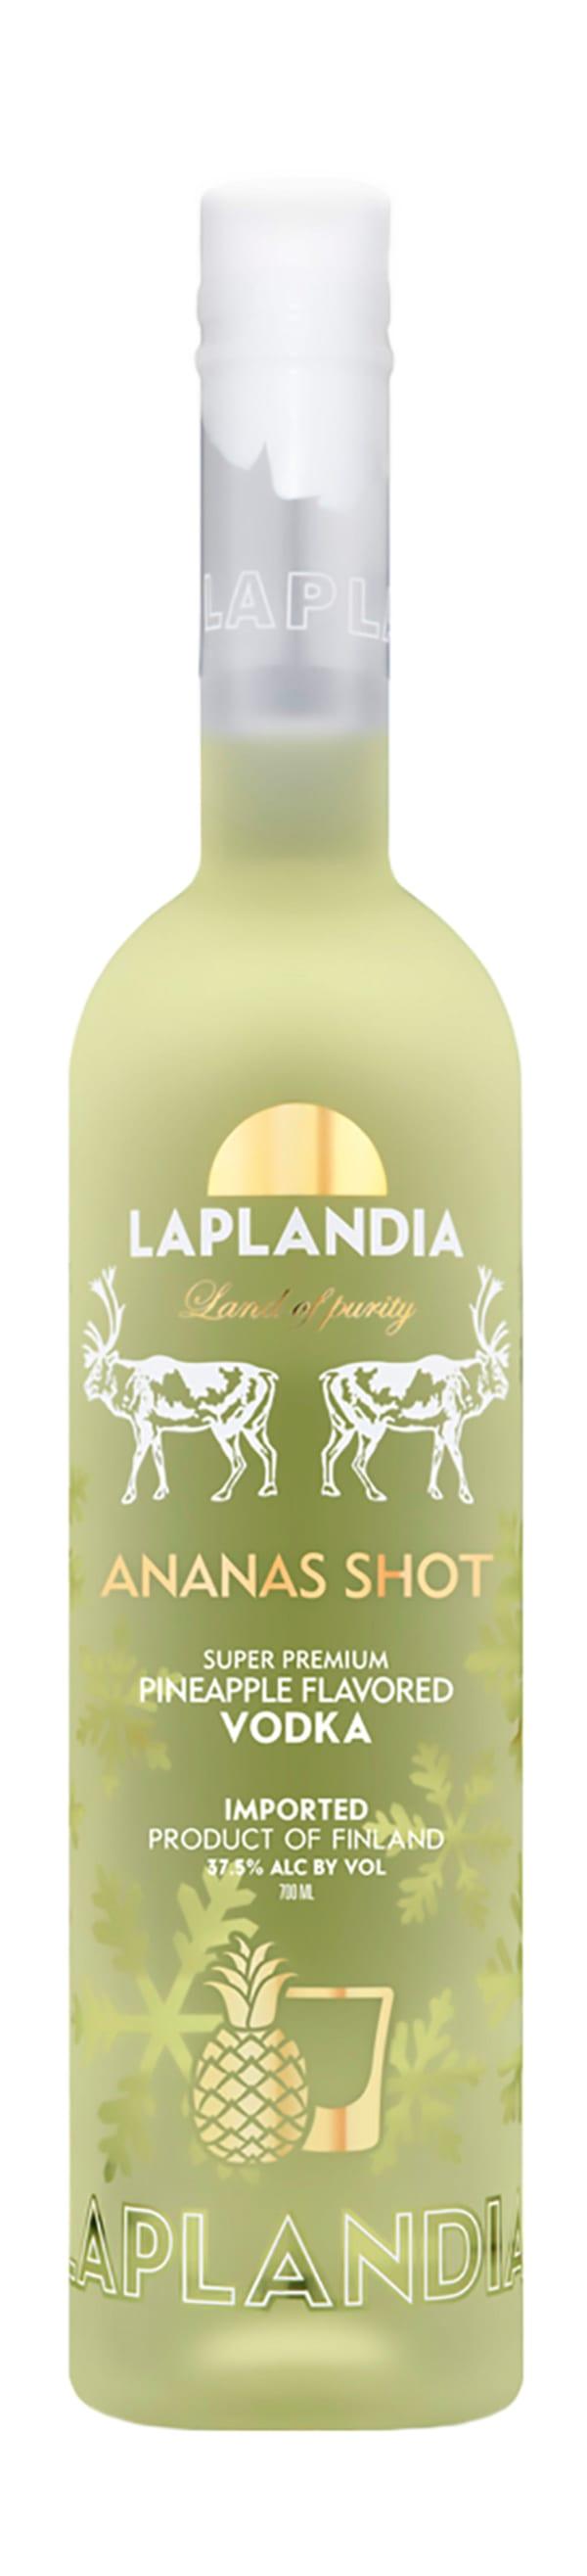 Laplandia Ananas Shot Vodka